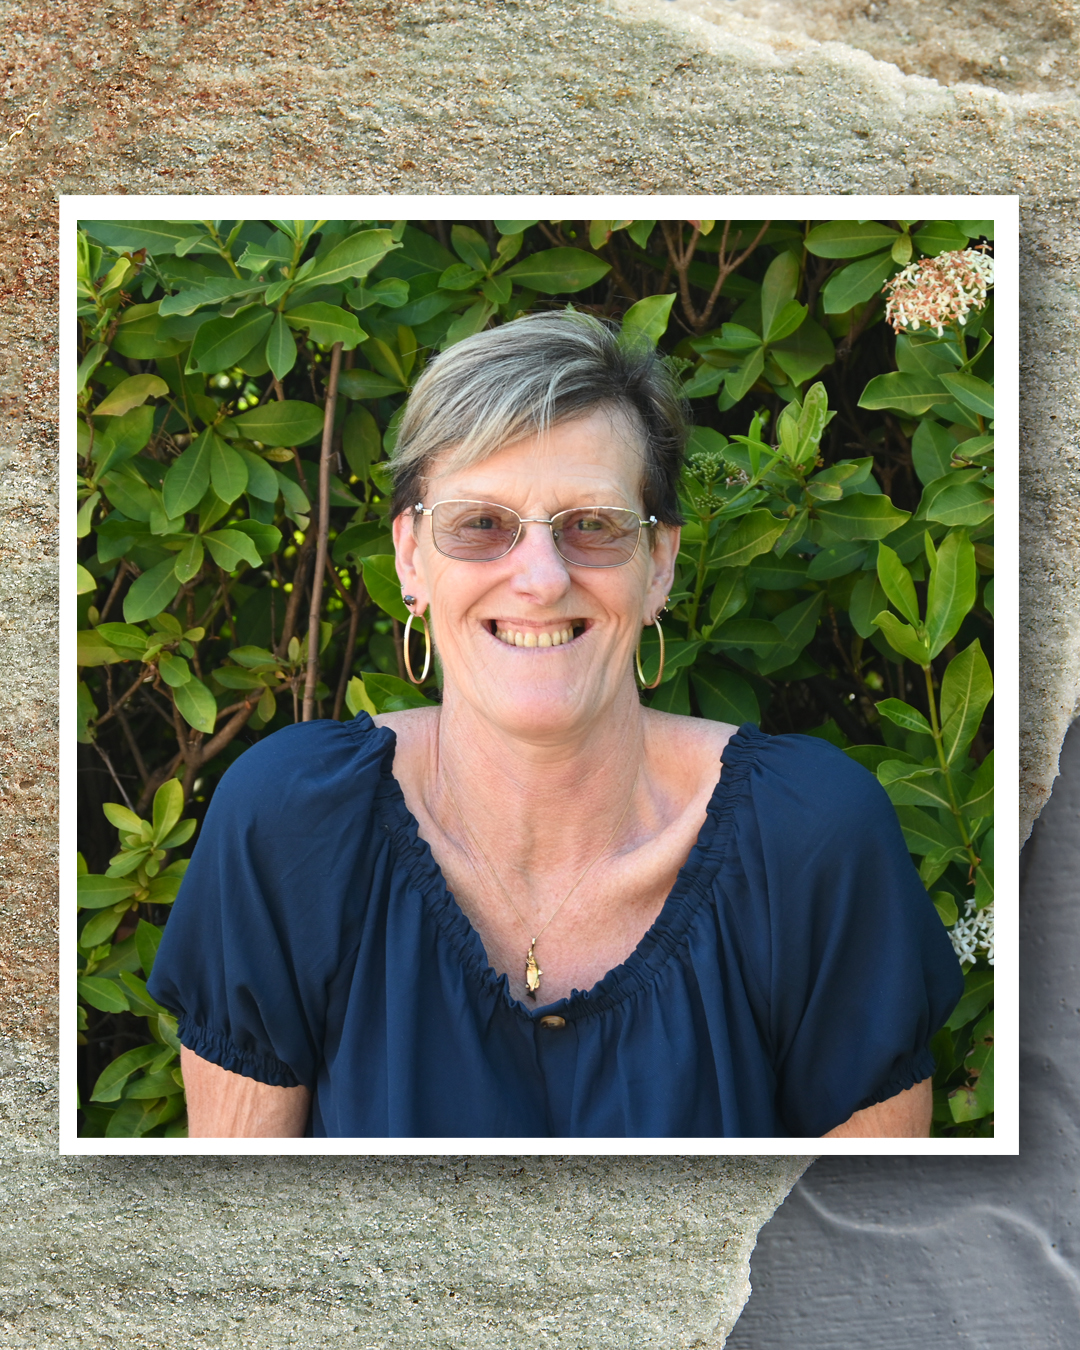 Rosemary Taffinder